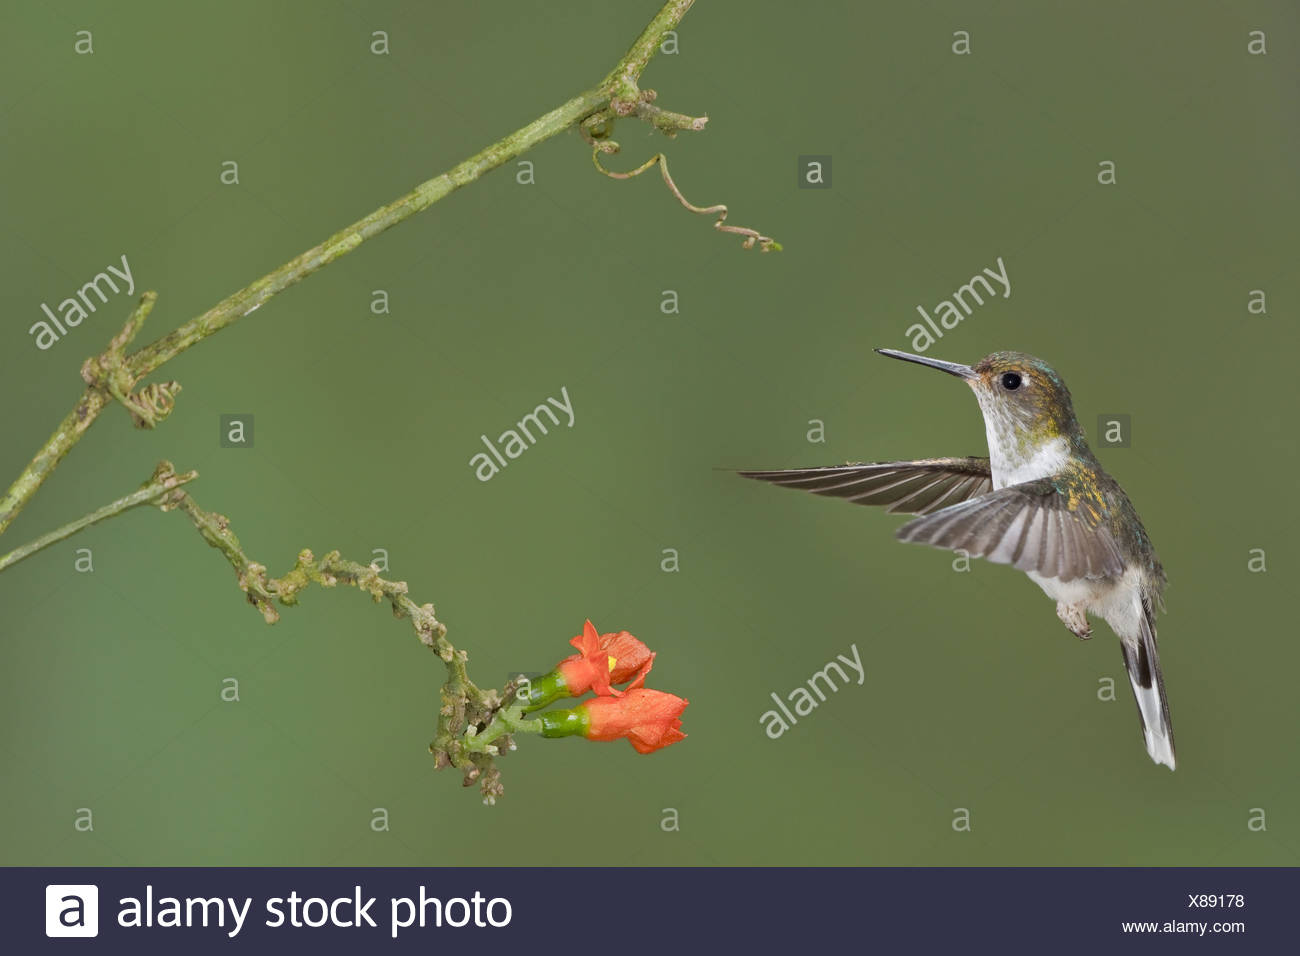 Ecuadorian Piedtail (Phlogophilus hemileucurus) feeding at a flower while flying at the Wildsumaco reserve in eastern Ecuador. - Stock Image